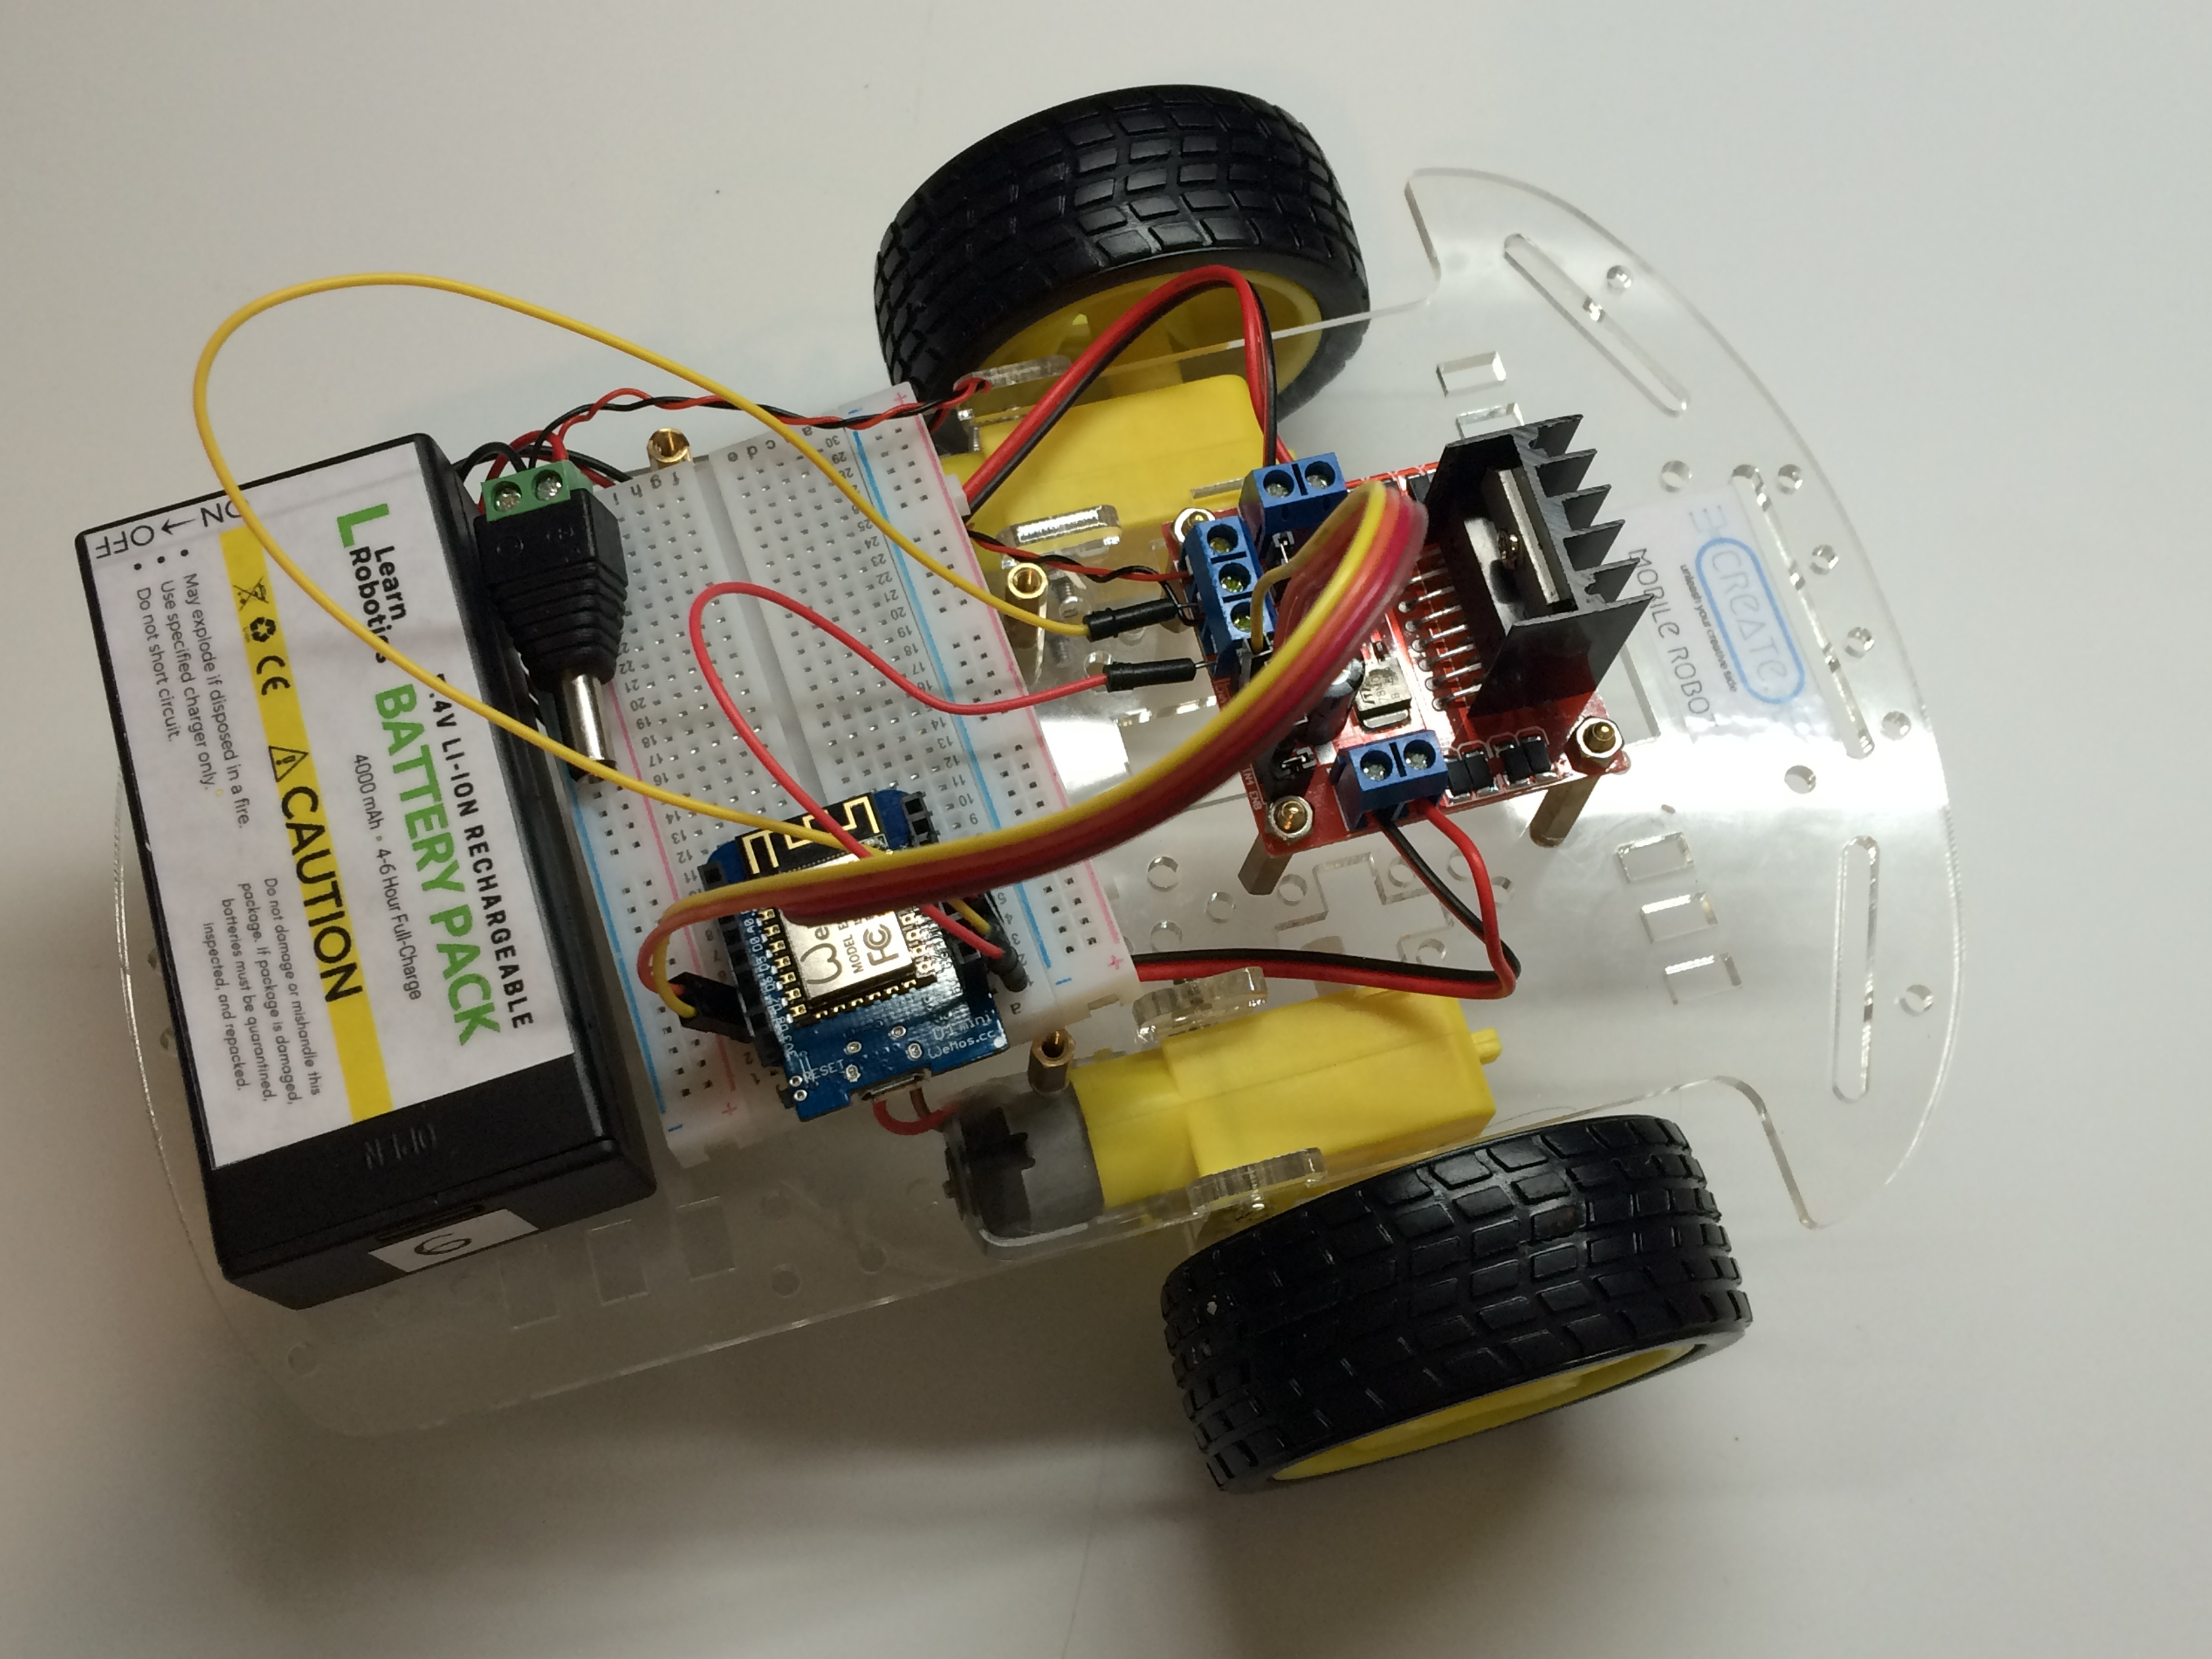 wemos wifi controlled robot using l298n